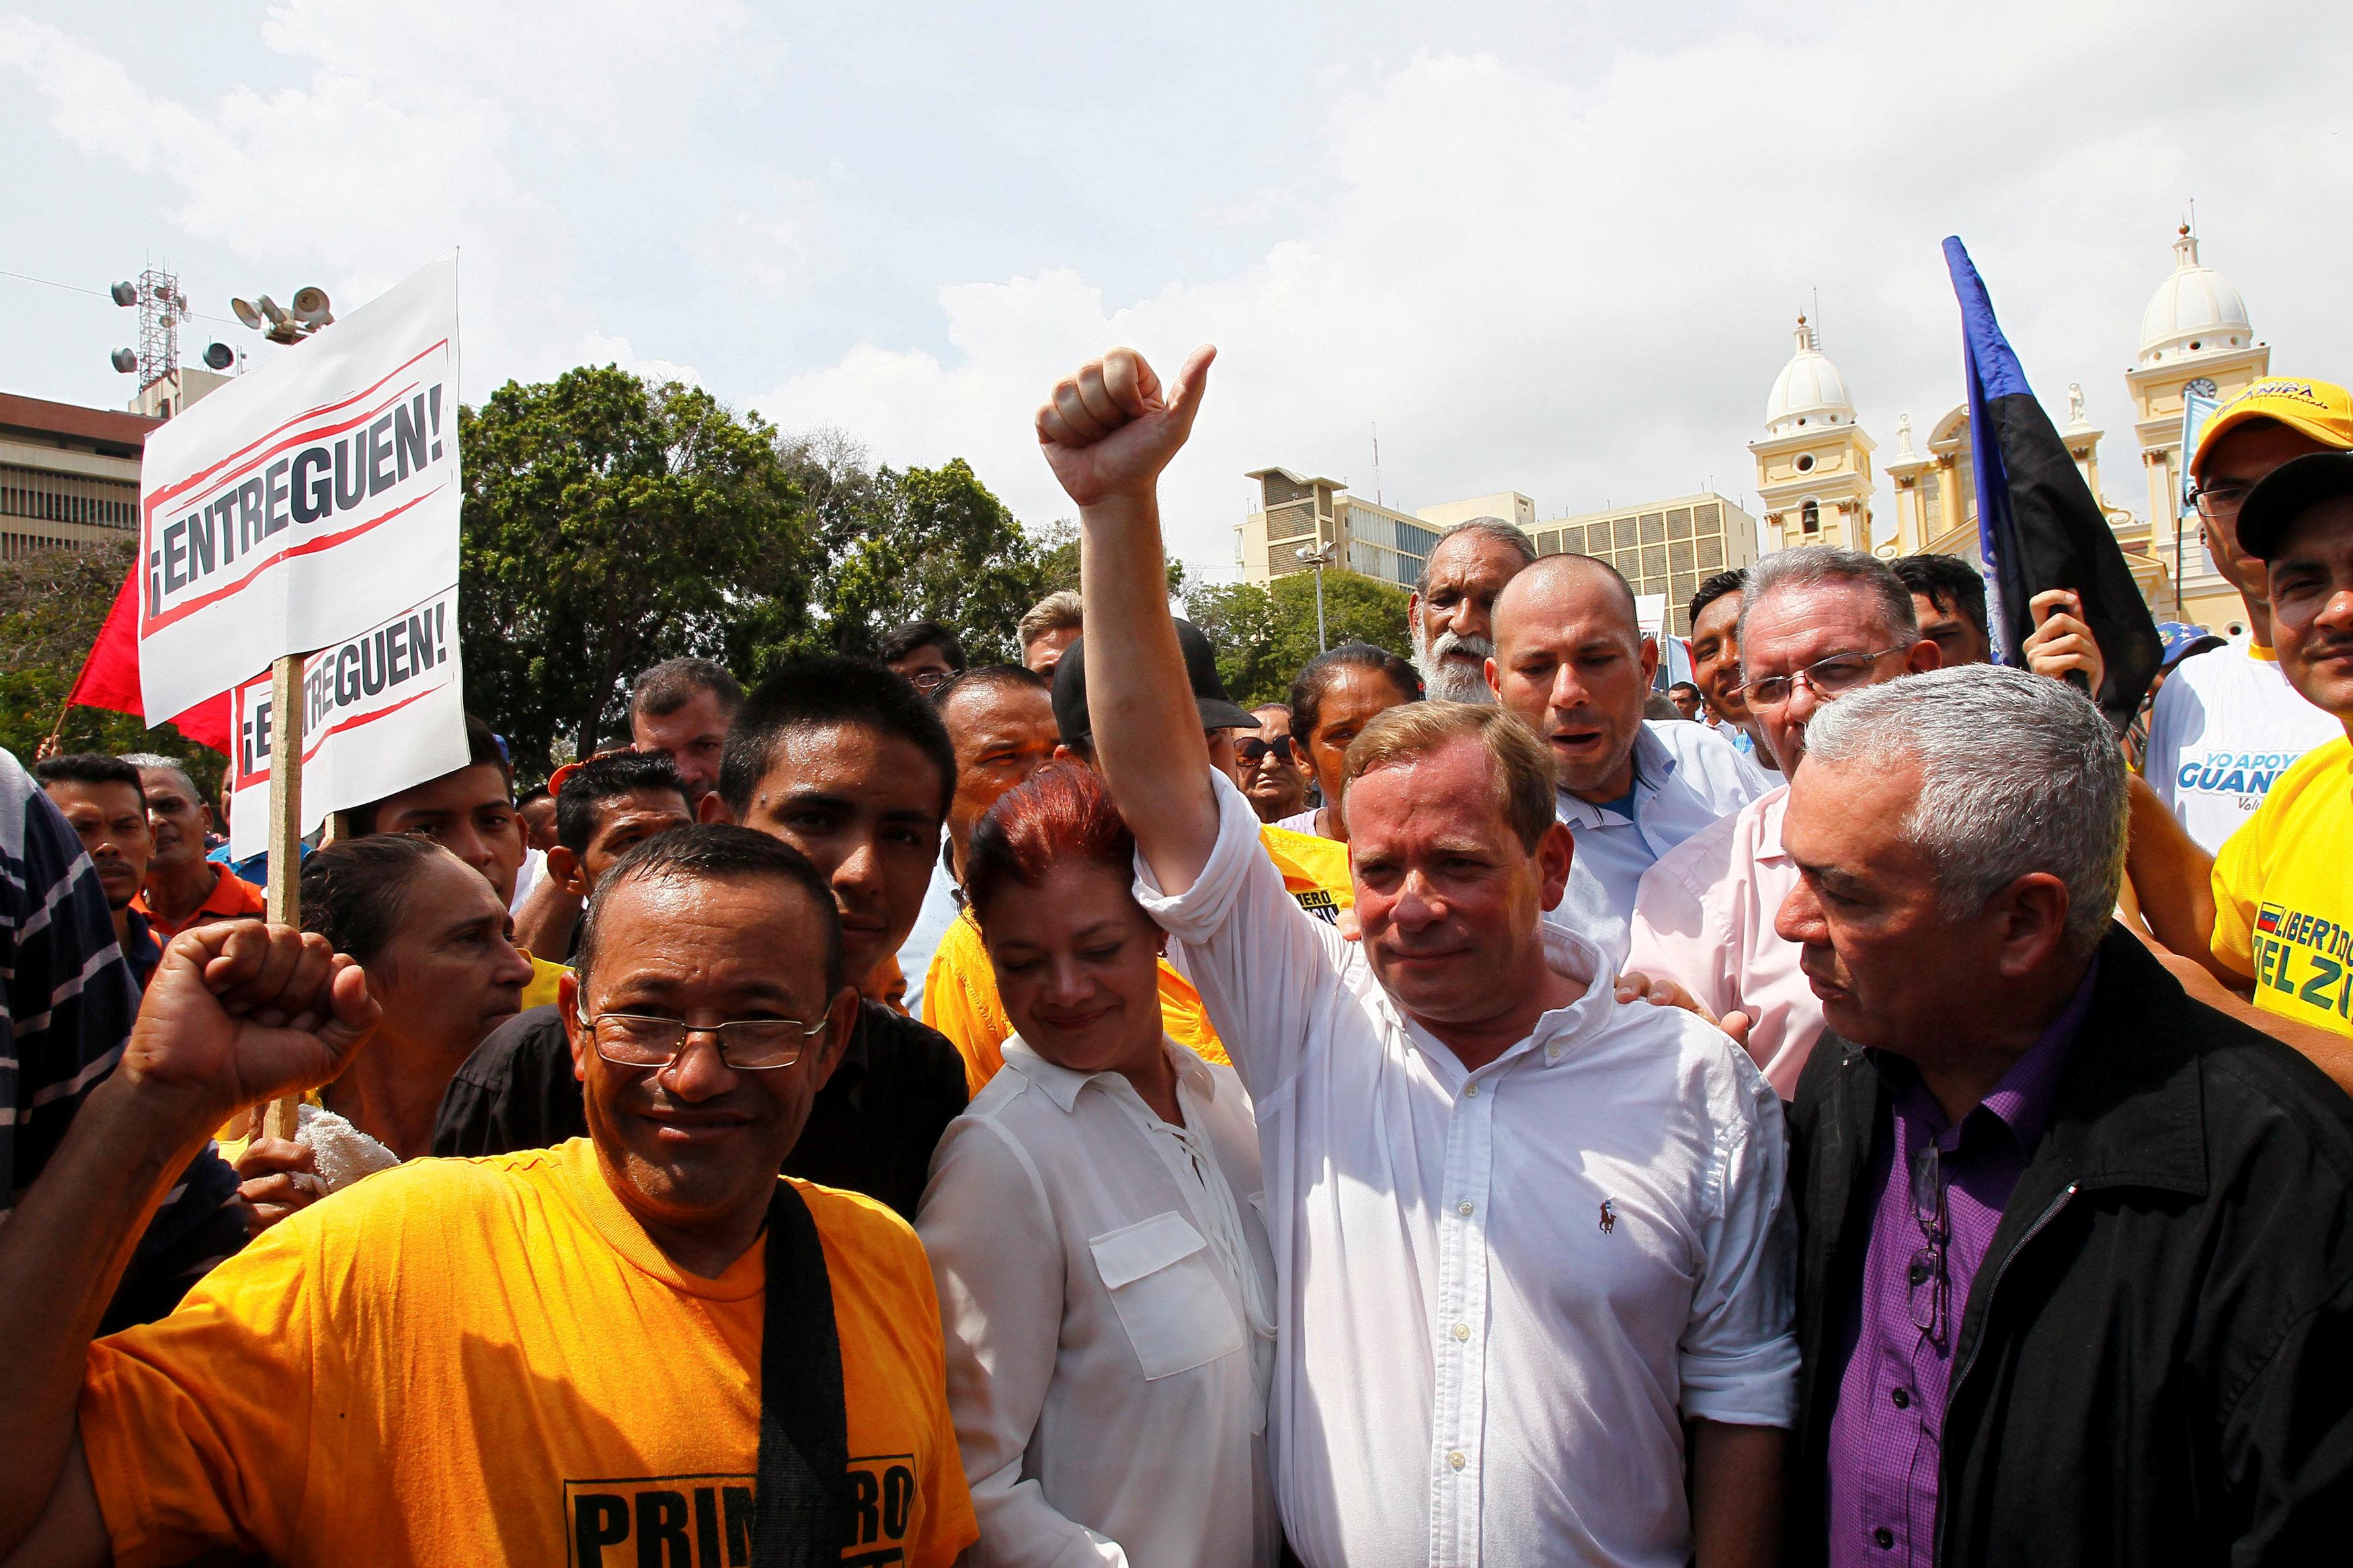 Venezuelan anti-Maduro governor sacked, opposition in chaos